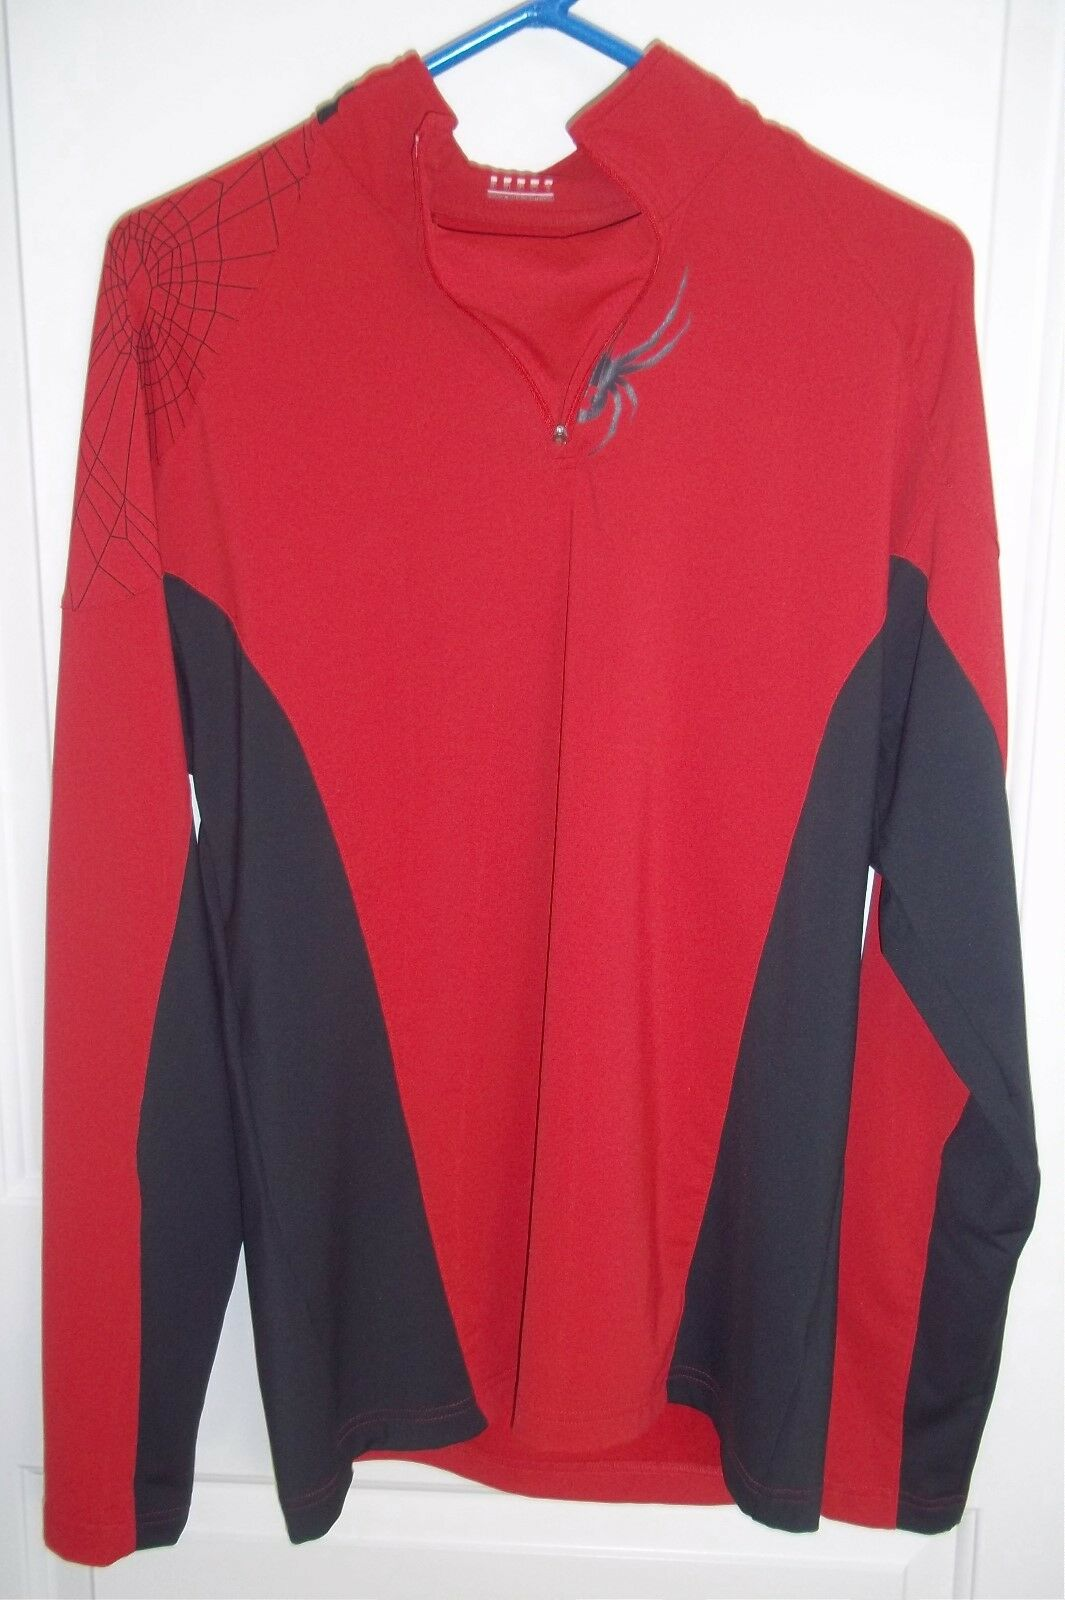 SPYDER Base Layer Top Shirt 1 4 Zipped Ski MENS Medium